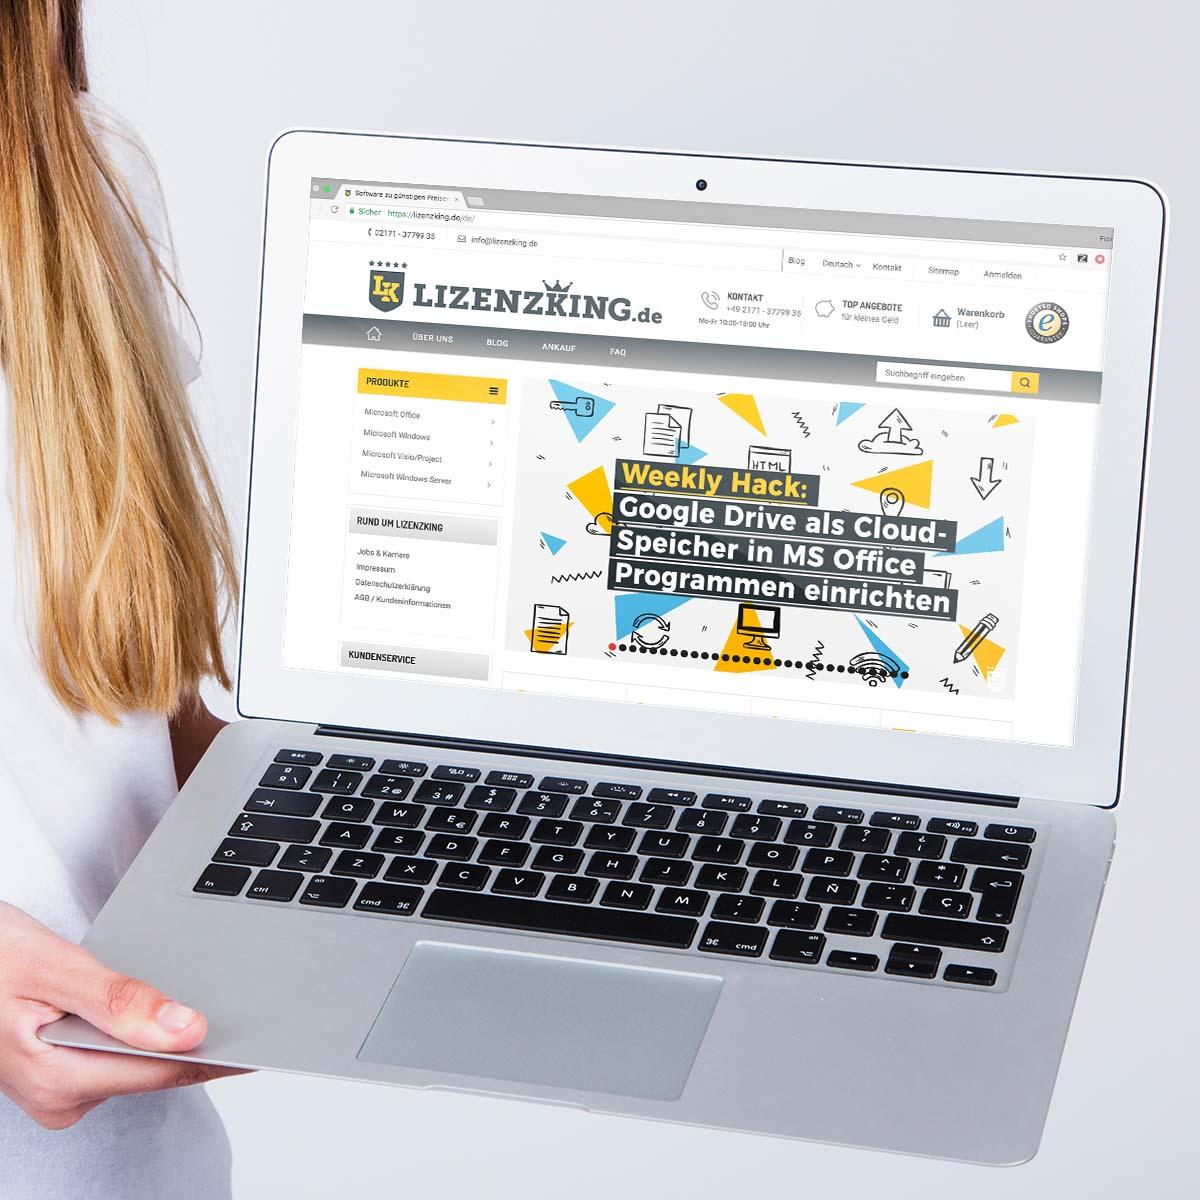 Content Guys Referenzen: Lizenzking.de